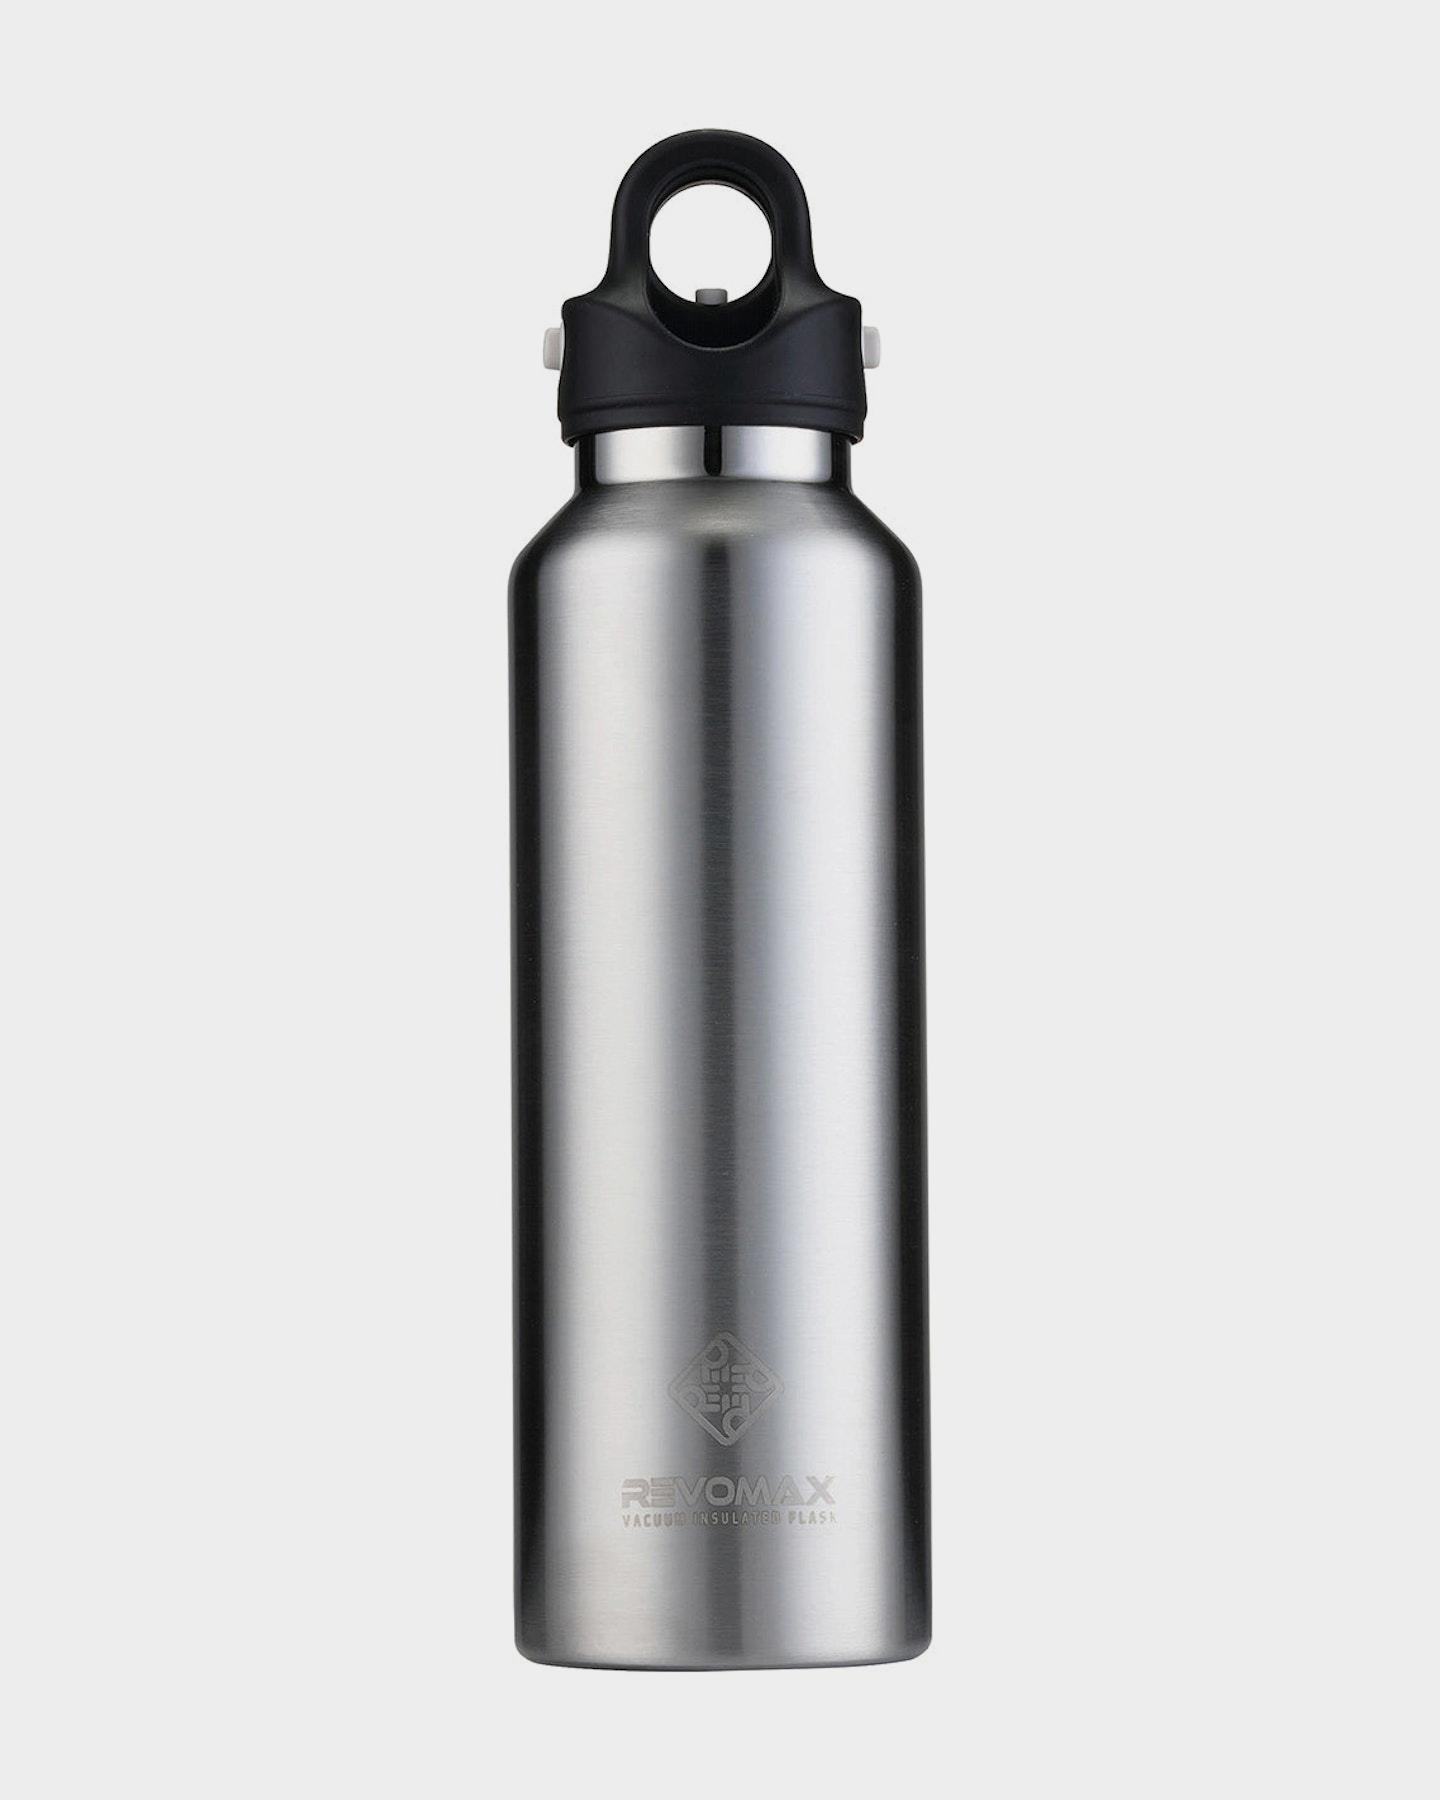 Revomax 592Ml - 20Oz Insulated Flask Drink Bottle Galaxy Silver